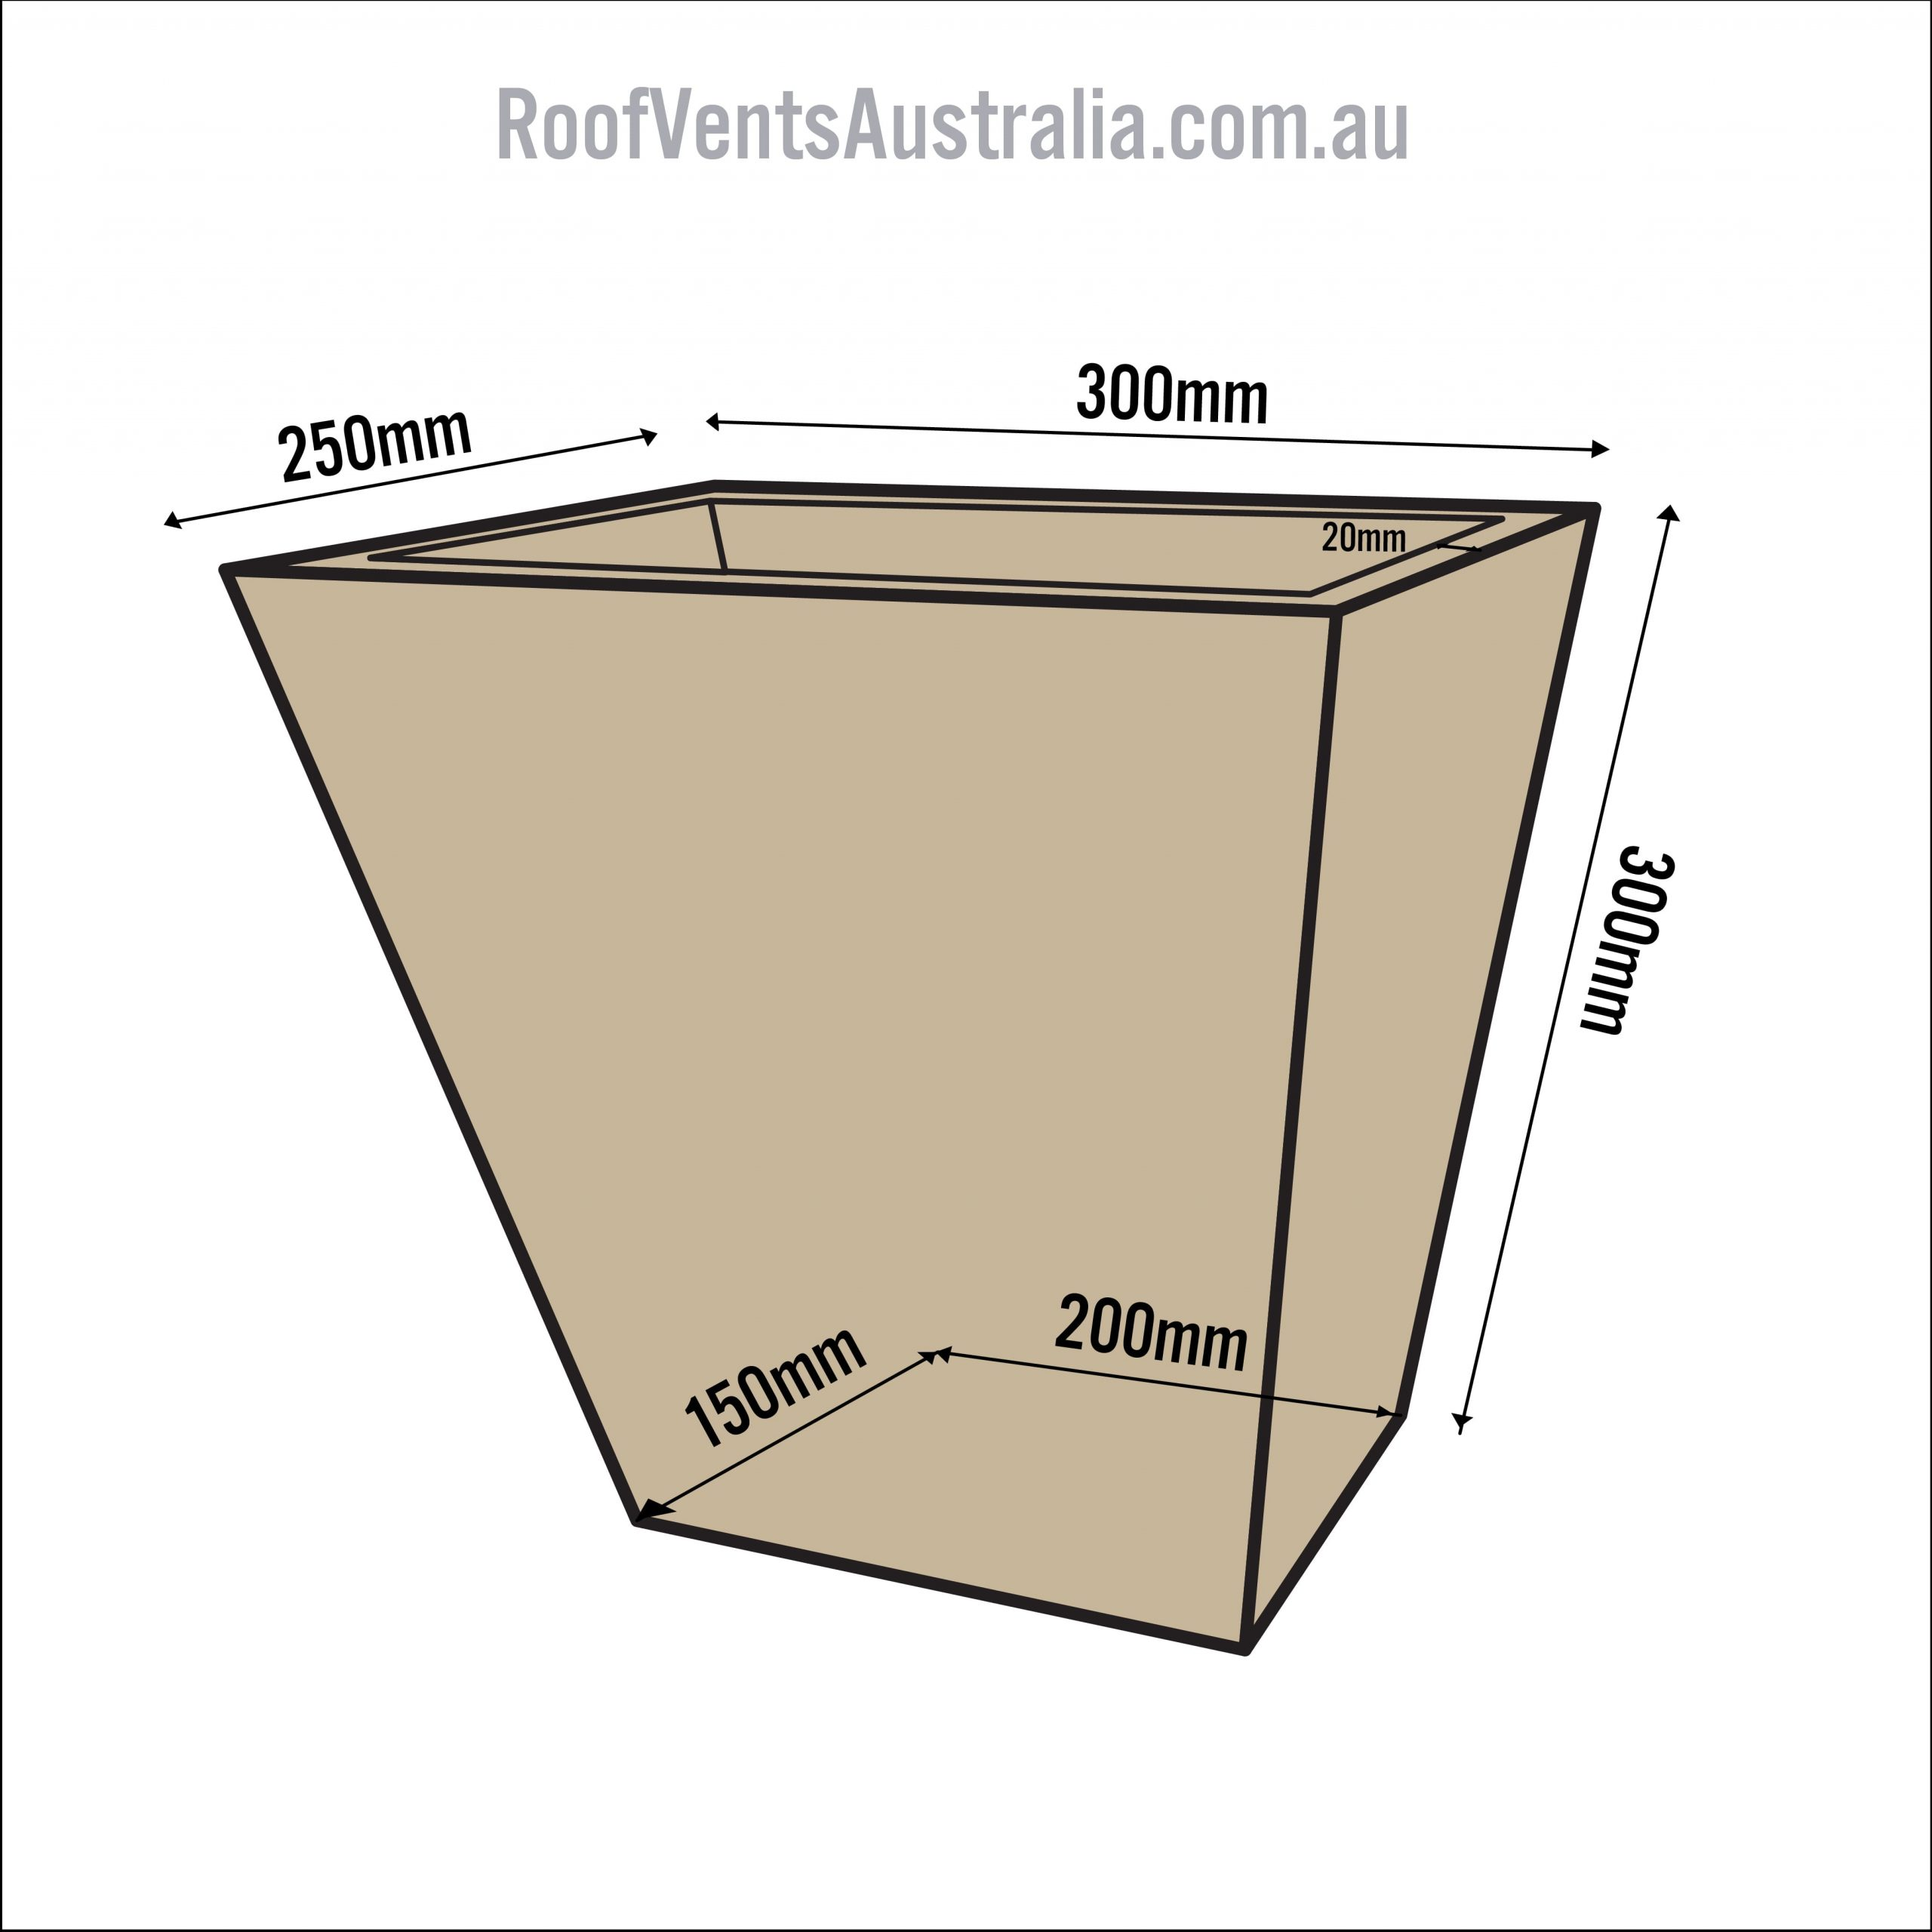 Standart Tapered Paperback Roof Ventilation Whirlybirds